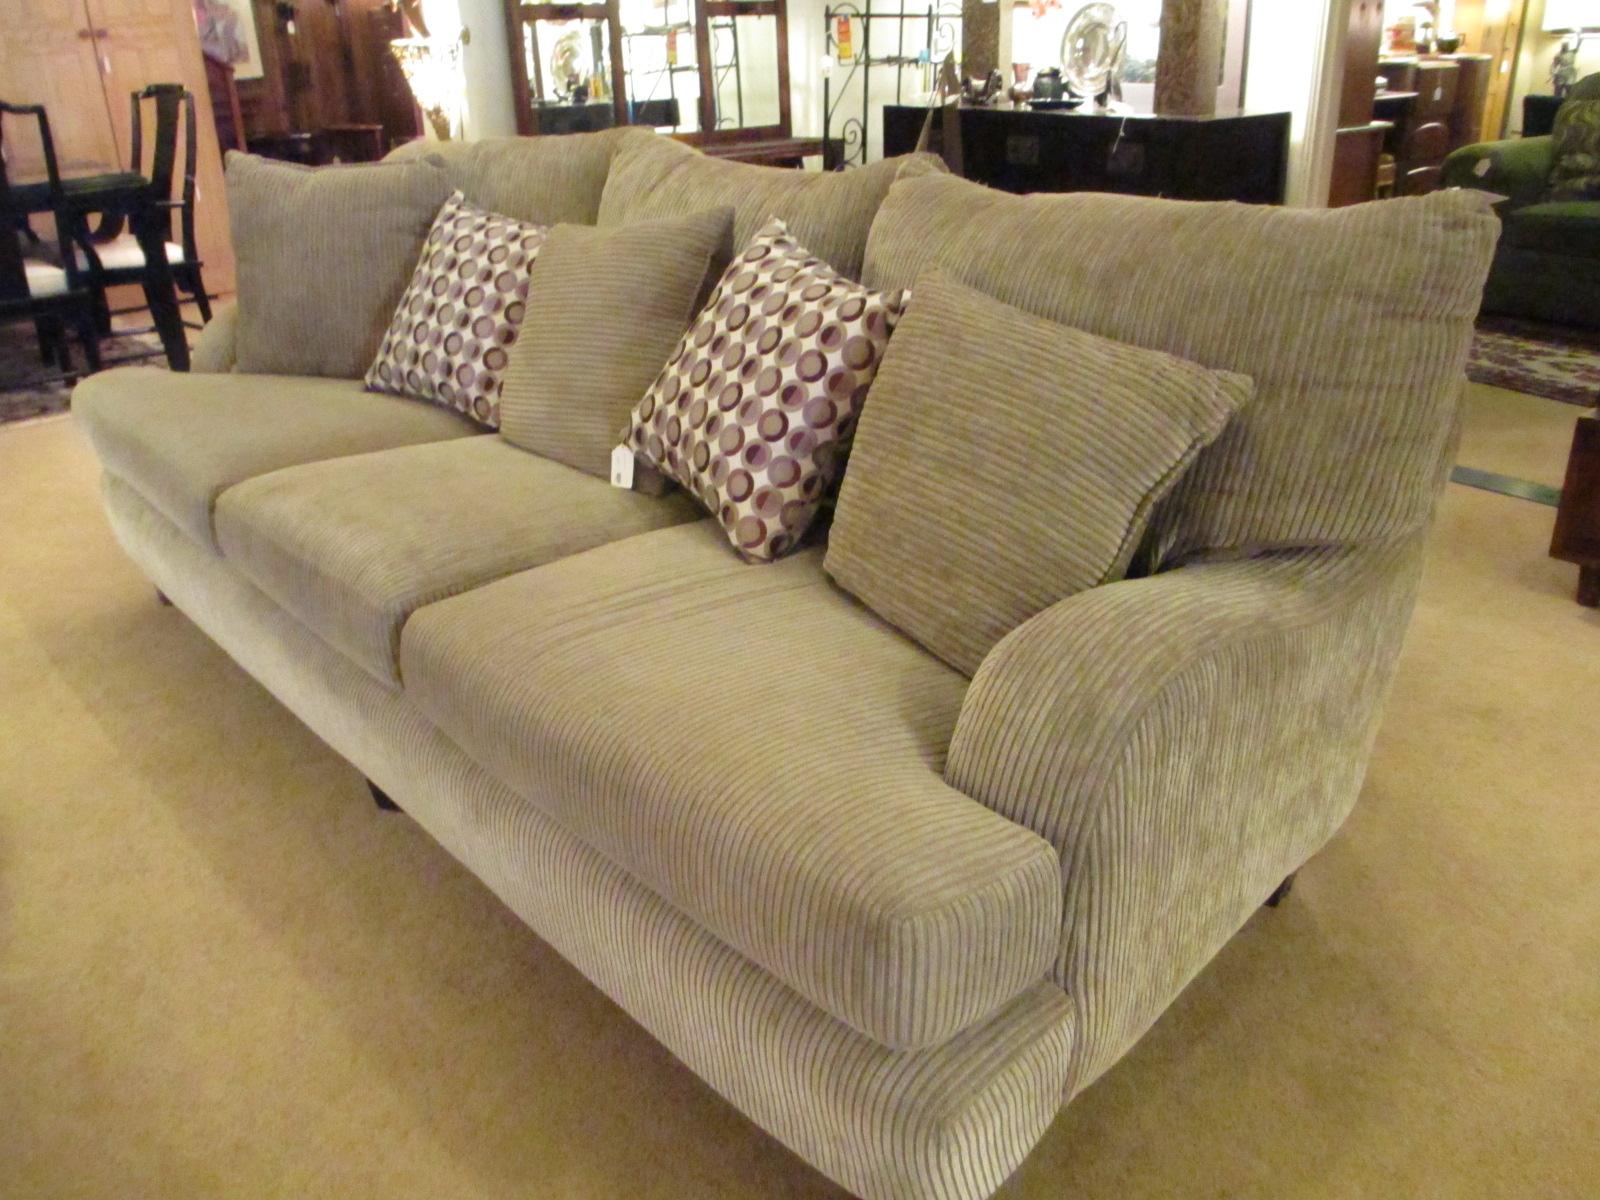 chenille sofa beds futon bed ikea khaki/grey ribbed – sold ballard consignment